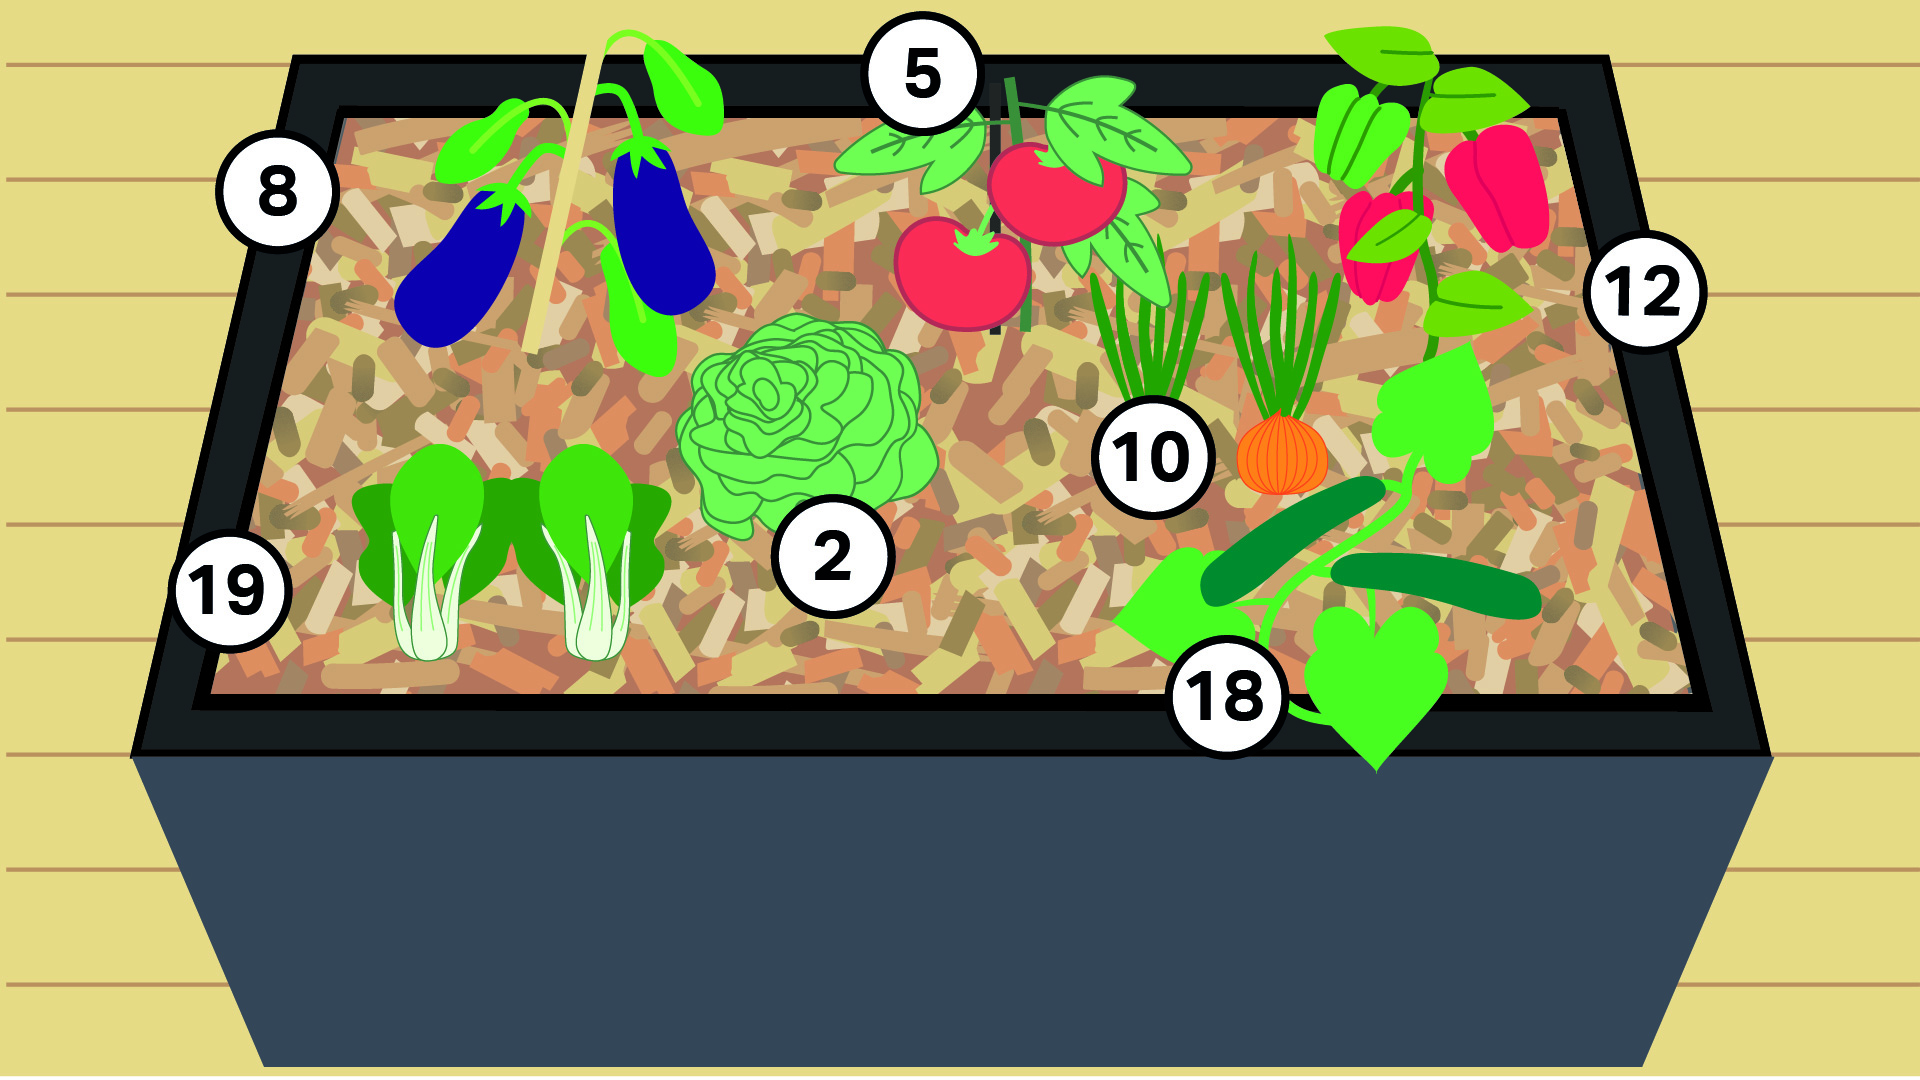 8 - Aubergine 5 - Tomate 12 - Poivron 19 - Blette 2 - Laitue 10 - Oignon 18 - Concombre